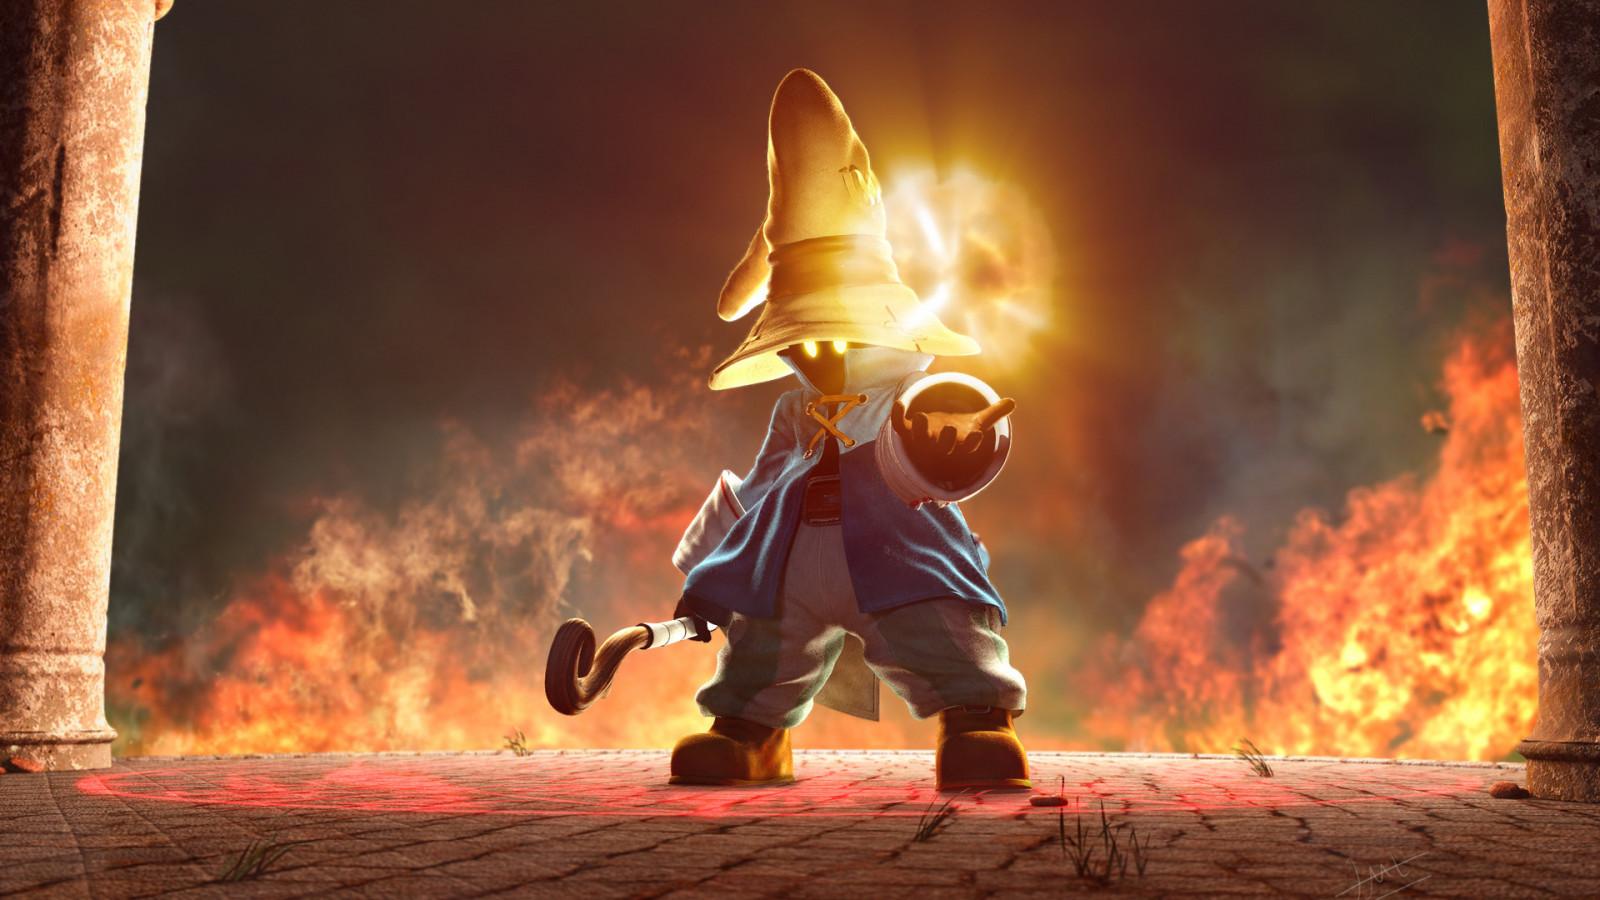 digital art video games artwork fire Final Fantasy Final Fantasy IX Vivi wildfire flame screenshot computer wallpaper stunt performer bonfire